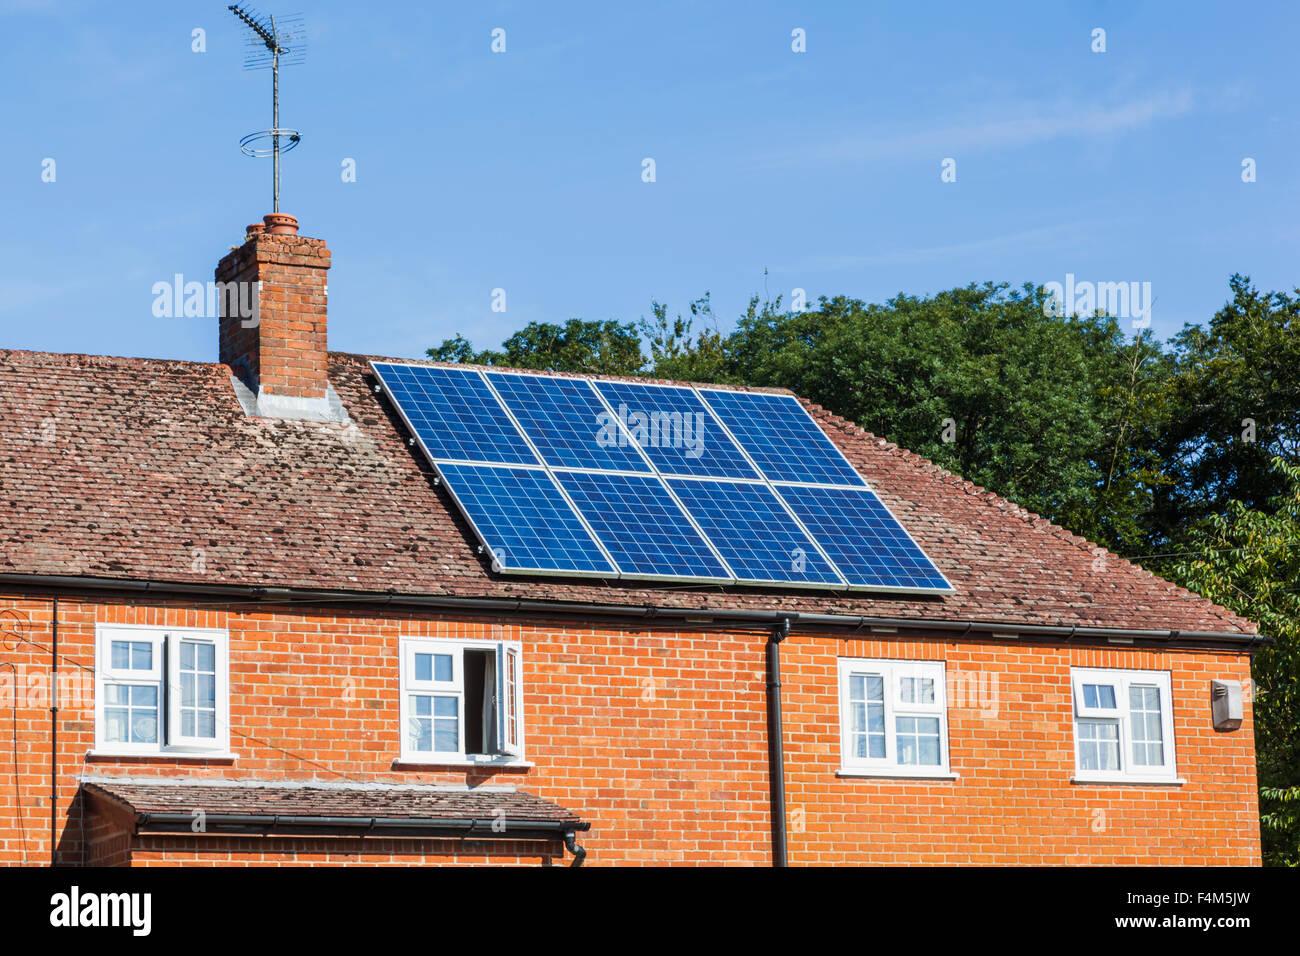 England, Hampshire, Rooftop Solar Panels - Stock Image